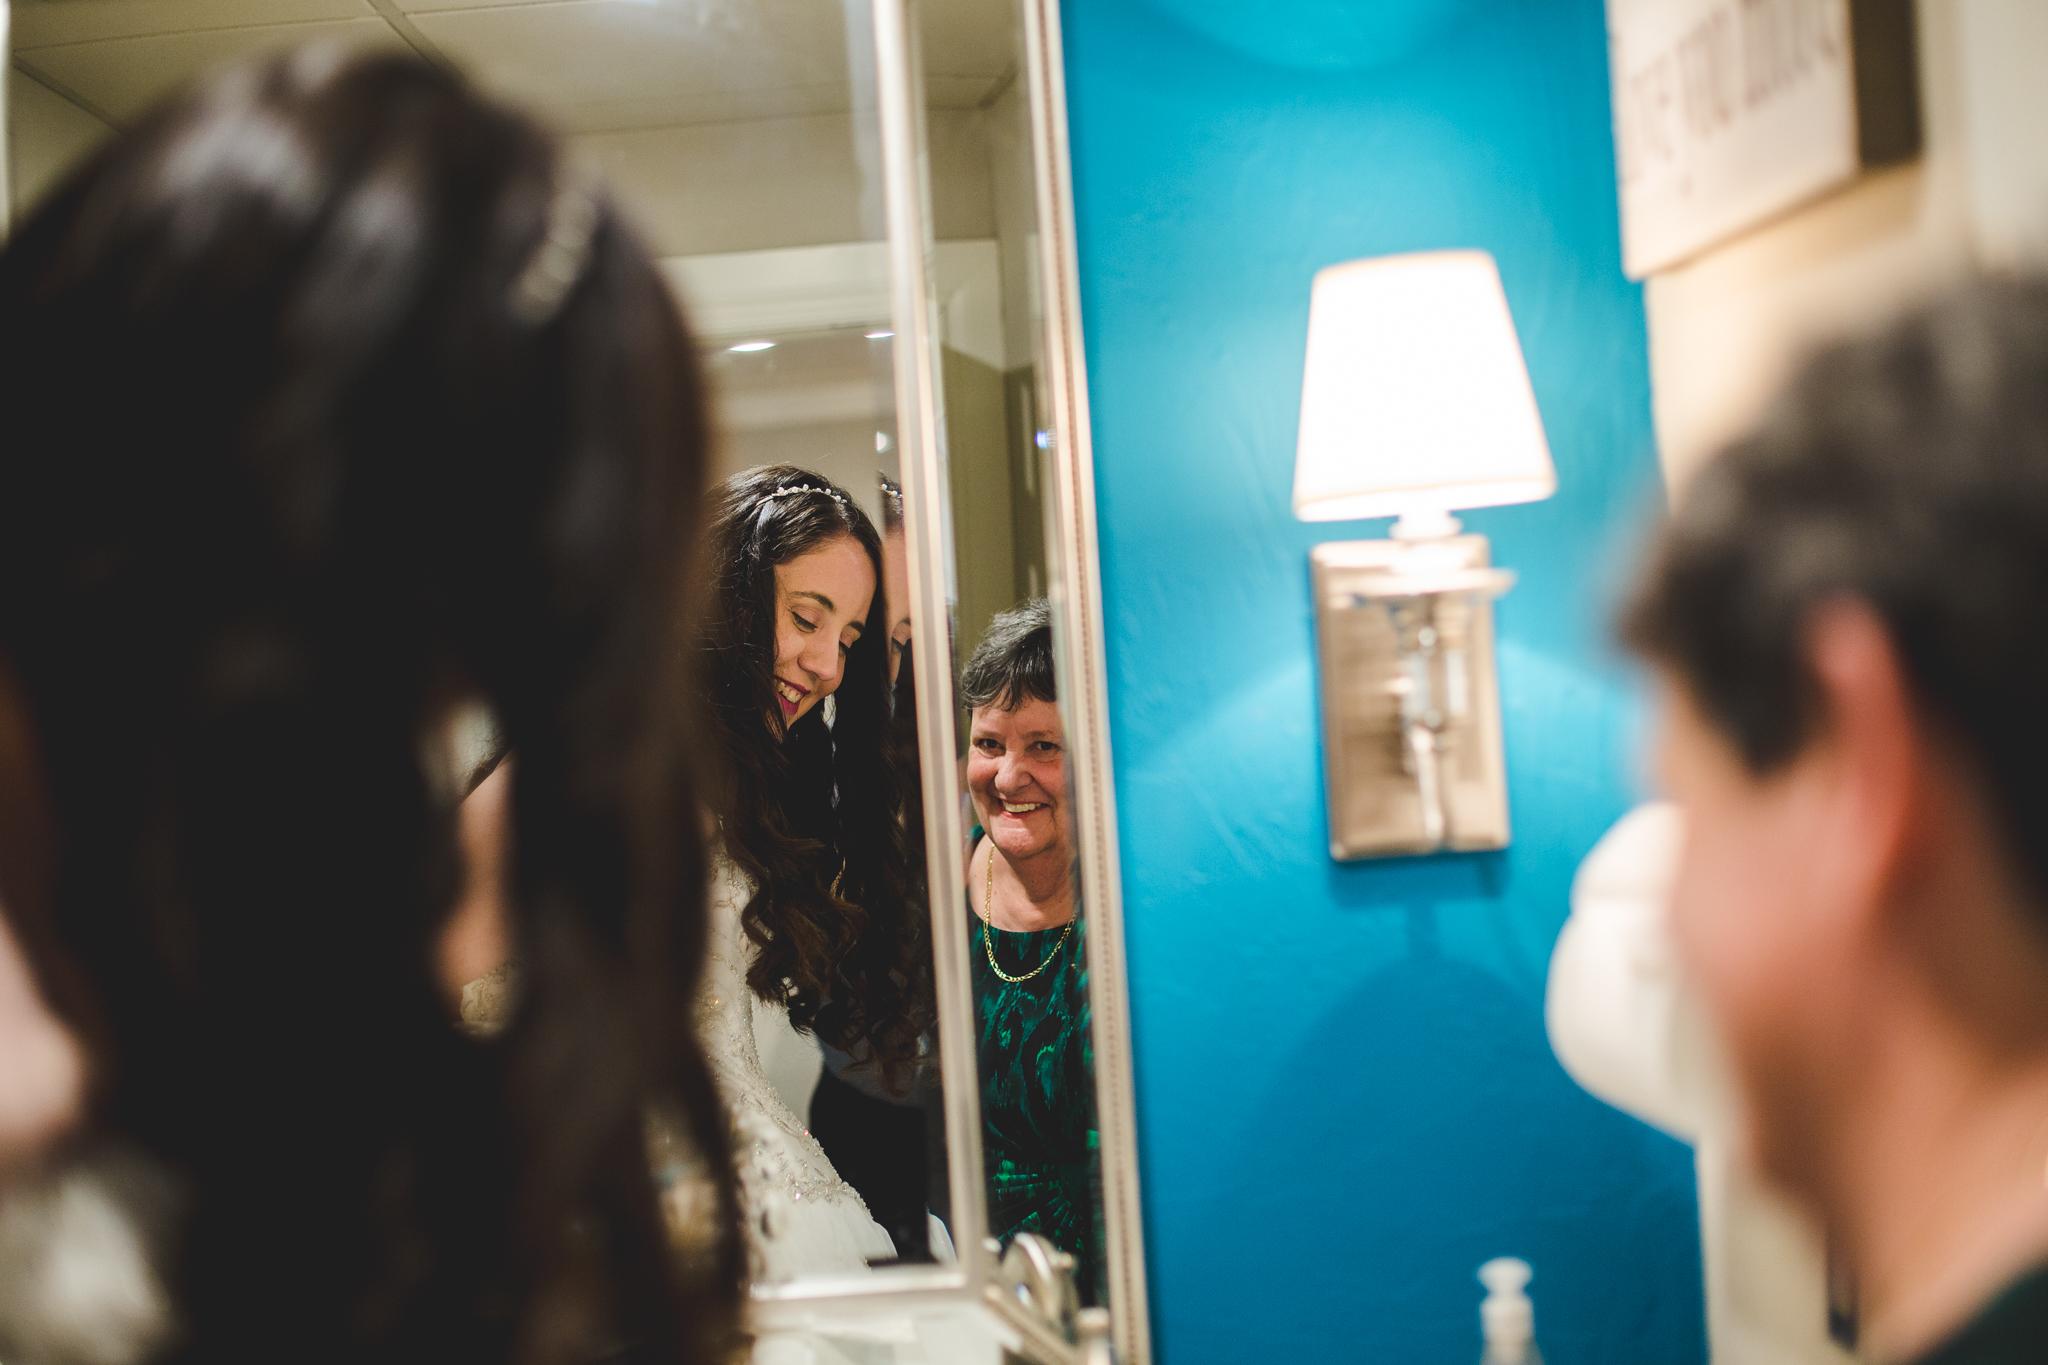 rs samantha bride smiles at aunt